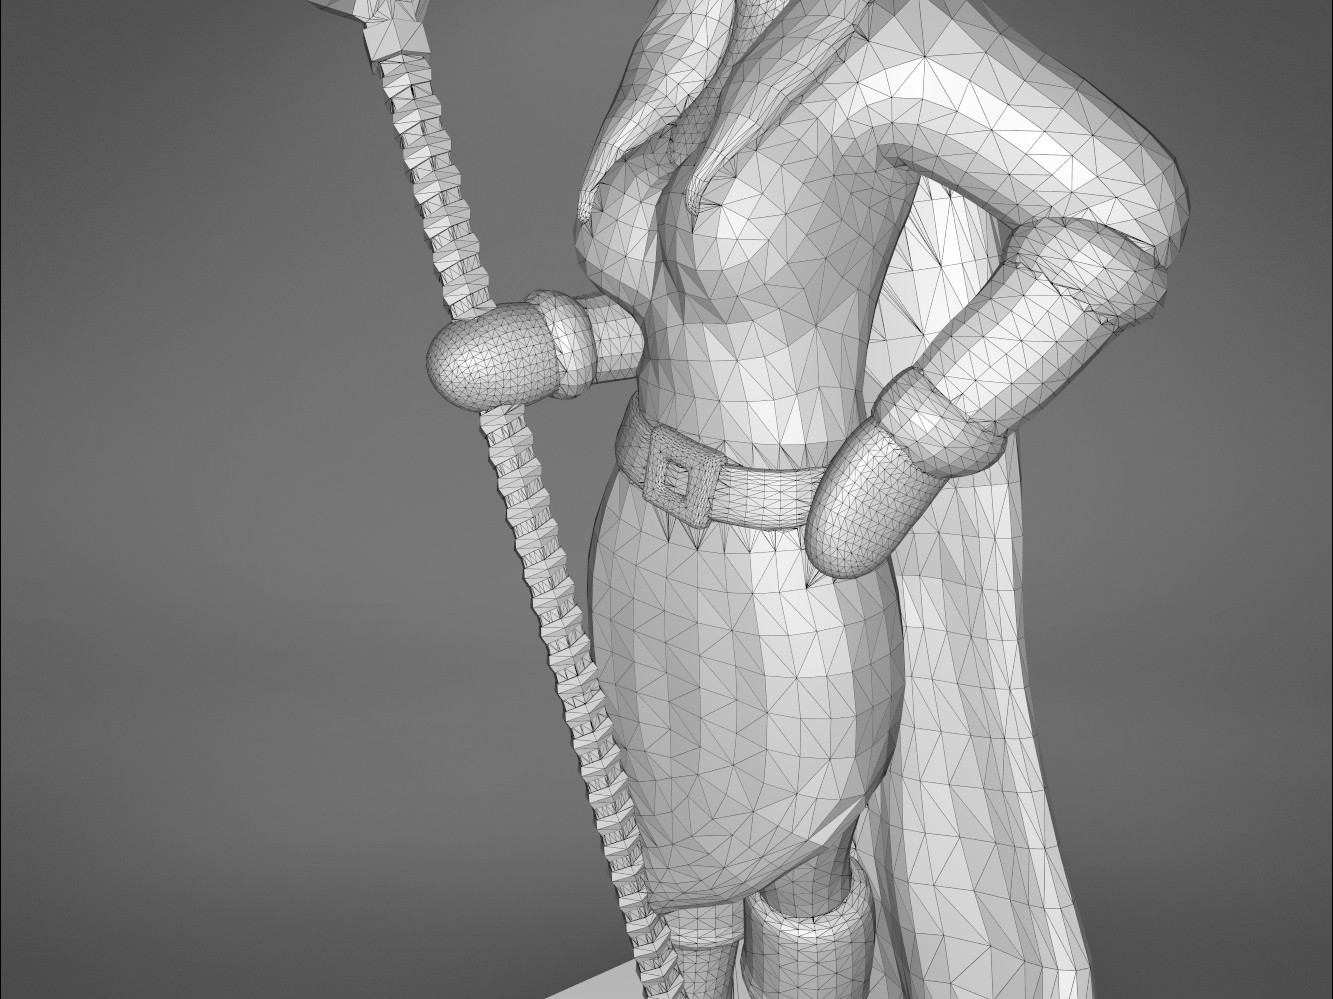 Mage_2_-detail_3.187.jpg Download STL file ELF MAGE FEMALE CHARACTER GAME FIGURES 3D print model • 3D printing template, 3D-mon